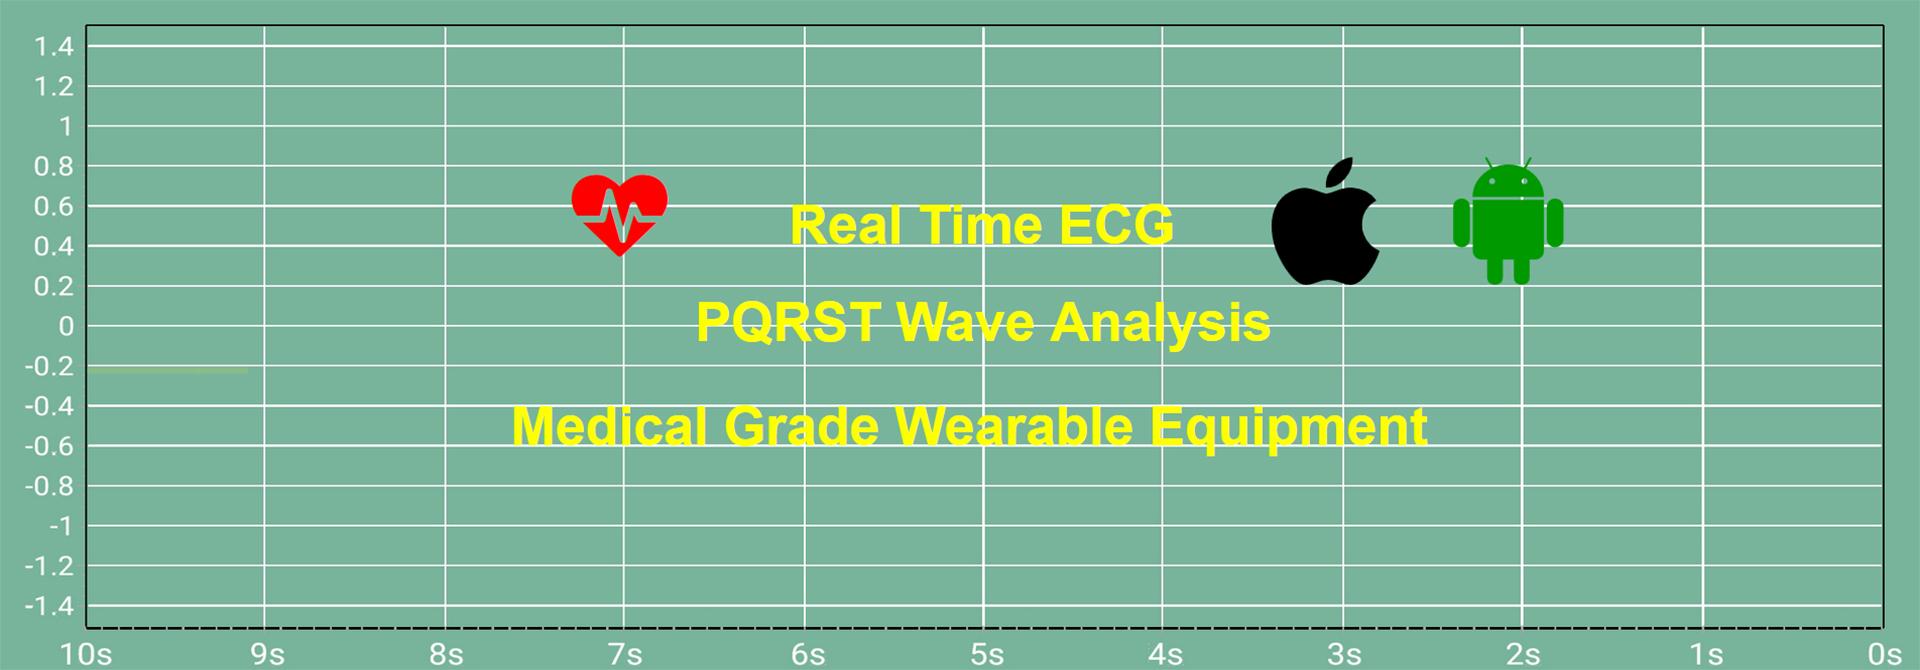 Chart-RealTime-ECG